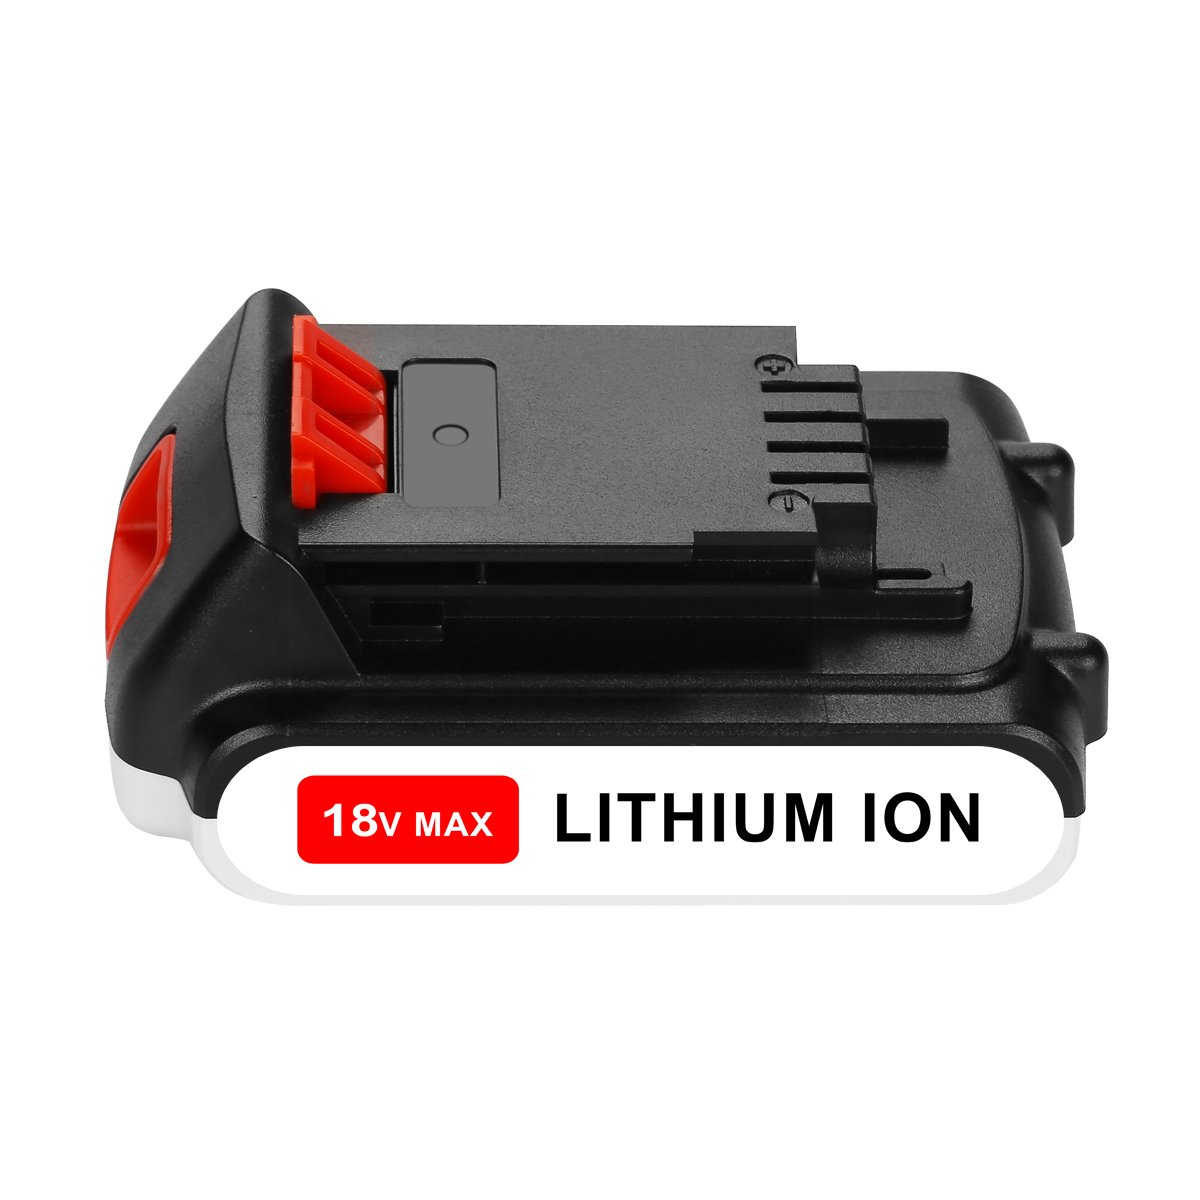 OPSON 18V 2,0Ah Lithium-ion Ersatz Akku f/ür Black /& Decker 18V BL2018 LBXR20 LBXR2020-OPE LB20 LBX20 BL2018-XJ GKC1825L GTC1850L20 STC1820 Werkzeugakkus